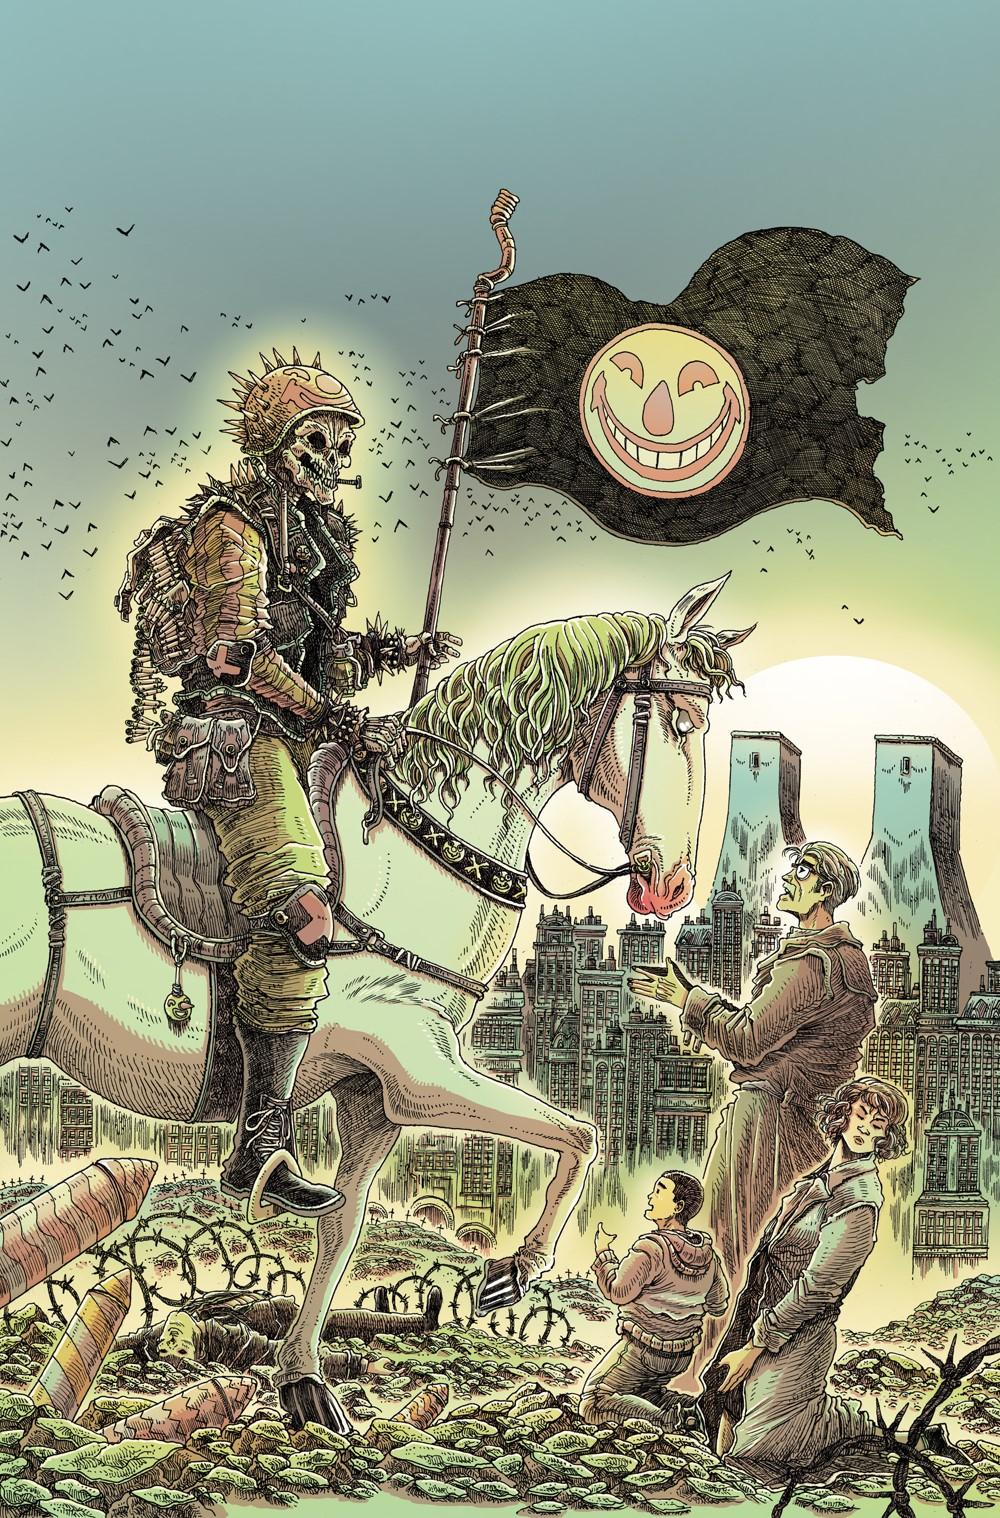 Joker8_Ratio_Variant_NOTRADEDRESS DC Comics October 2021 Solicitations